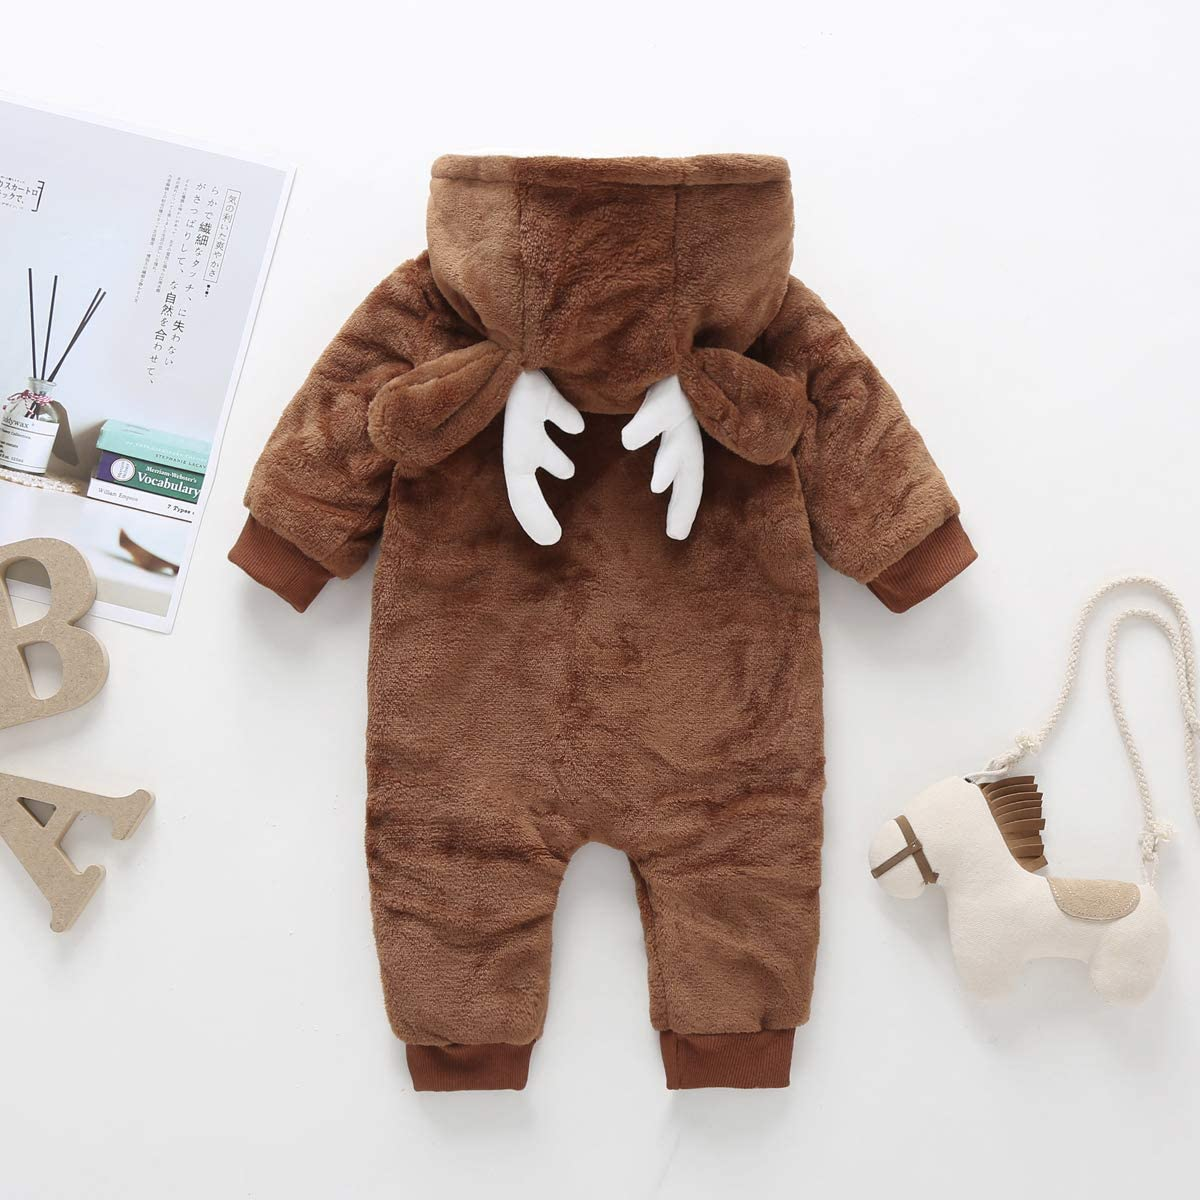 Hattfart Toddler Infant Baby Girl Boy Long Sleeve Deer Romper Jumpsuit Pajamas Xmas Outfit